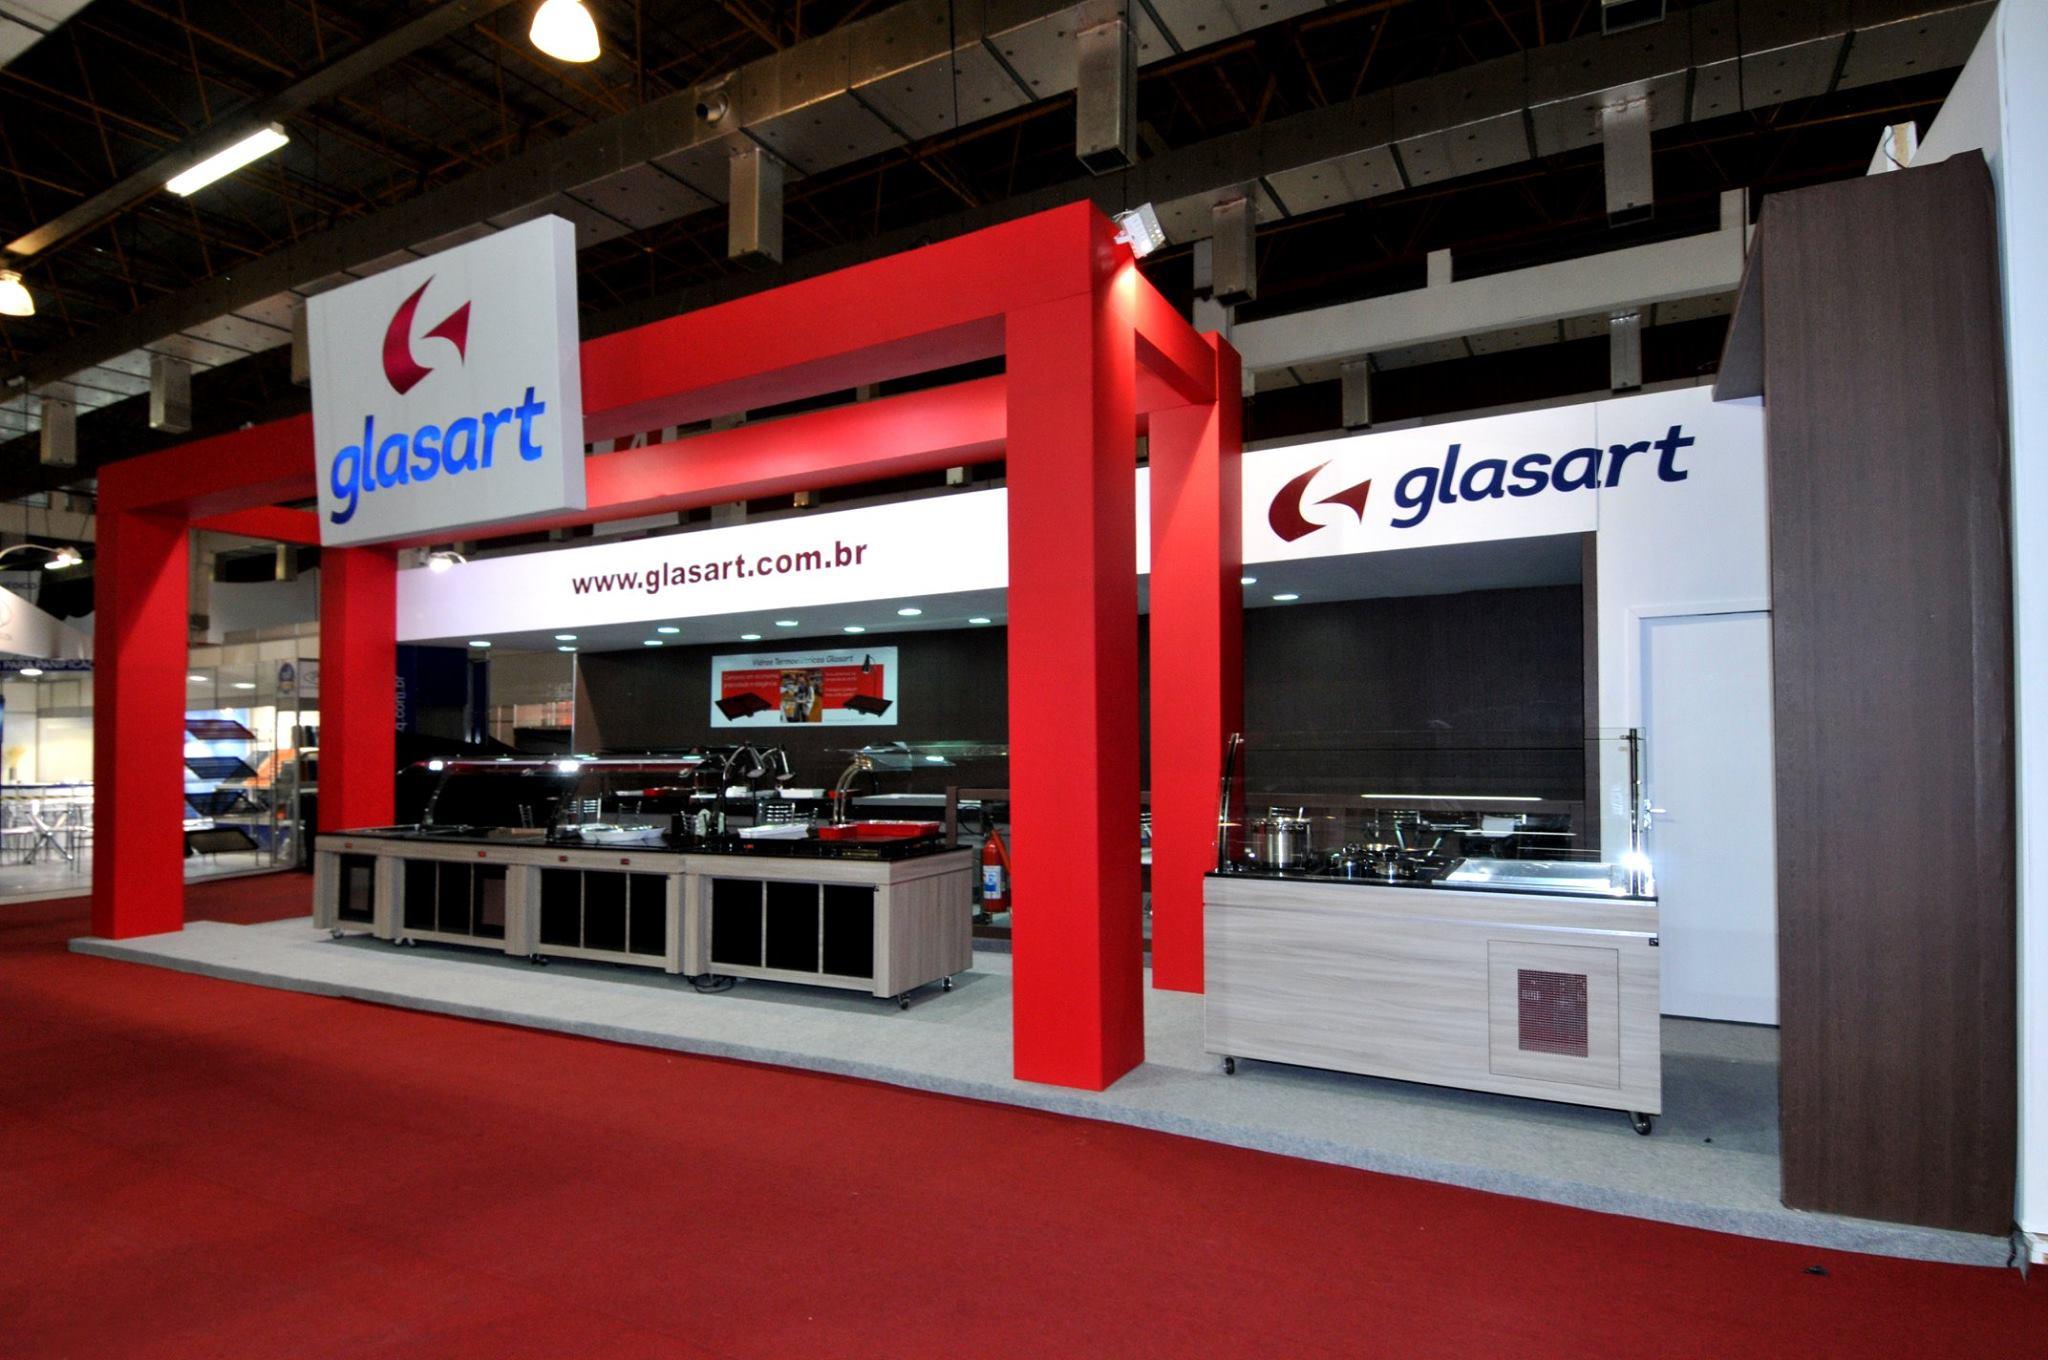 Glasart / FISPAL 2015